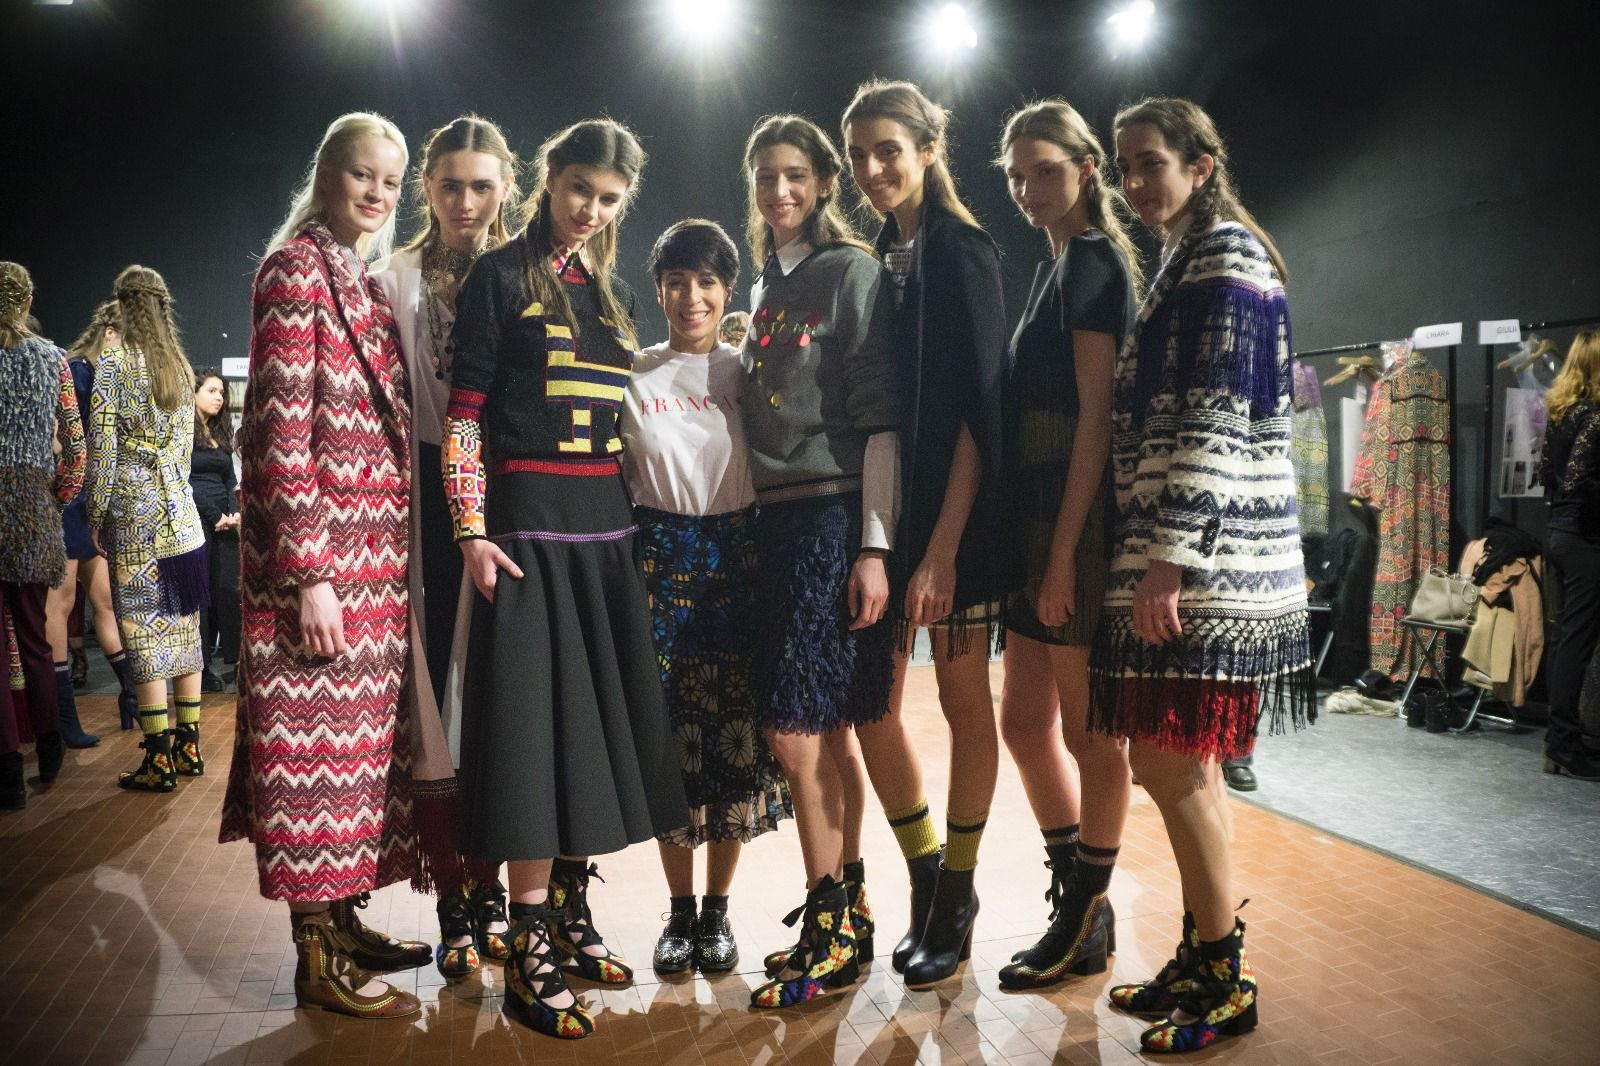 Shooting time! #Miahatami fashion show at #Altaroma #fashionhub #Franca❤ #VogueItalia